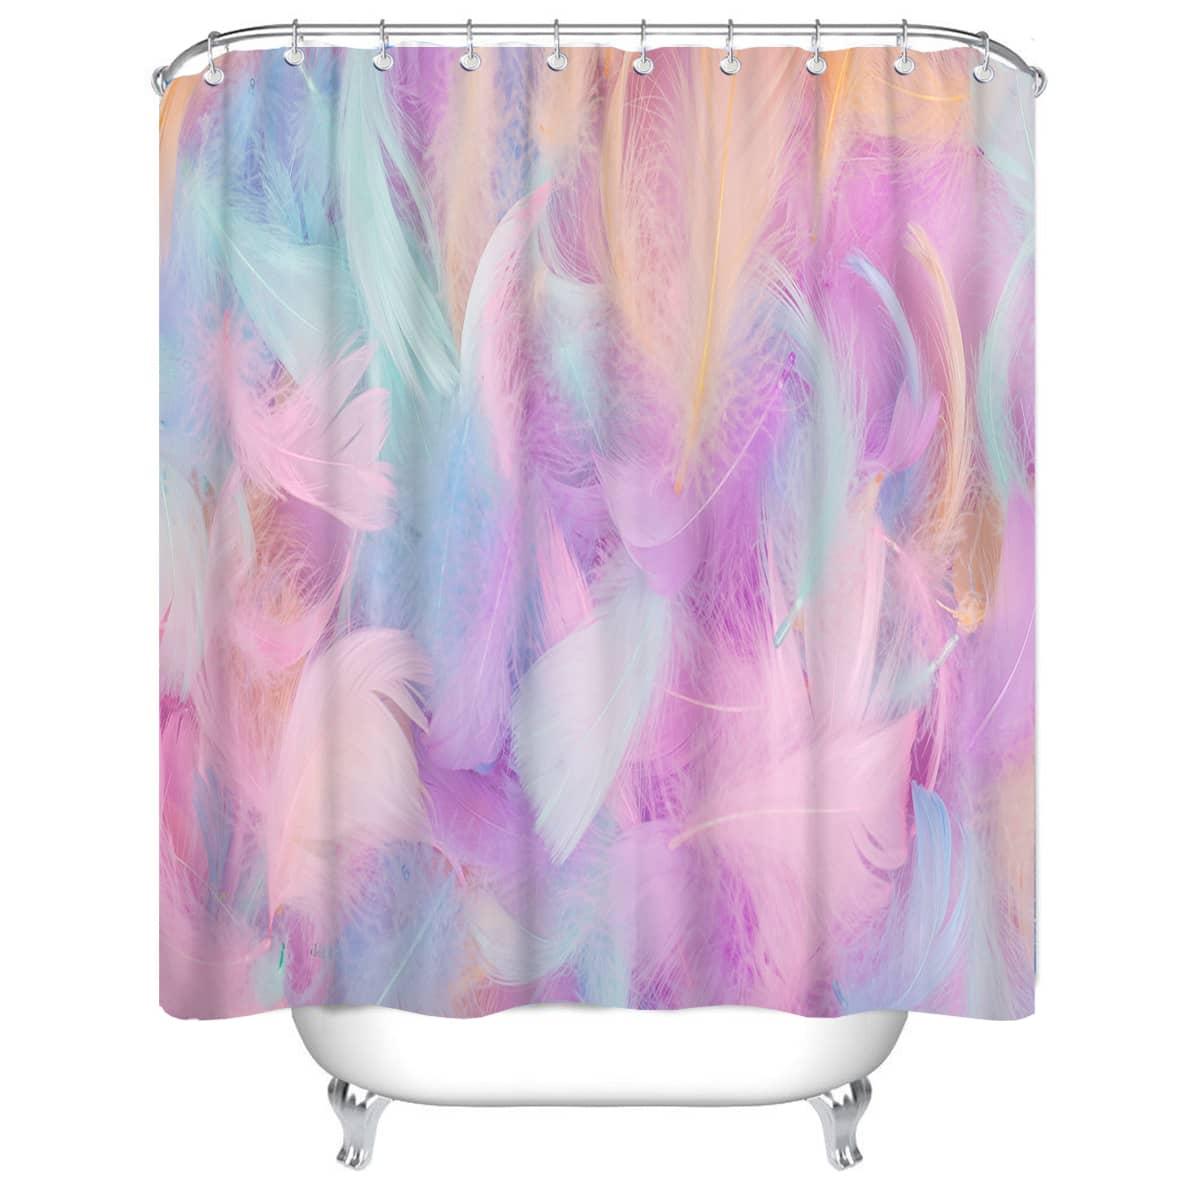 1 Stück Anti-Rutsch Duschvorhang mit Feder Muster